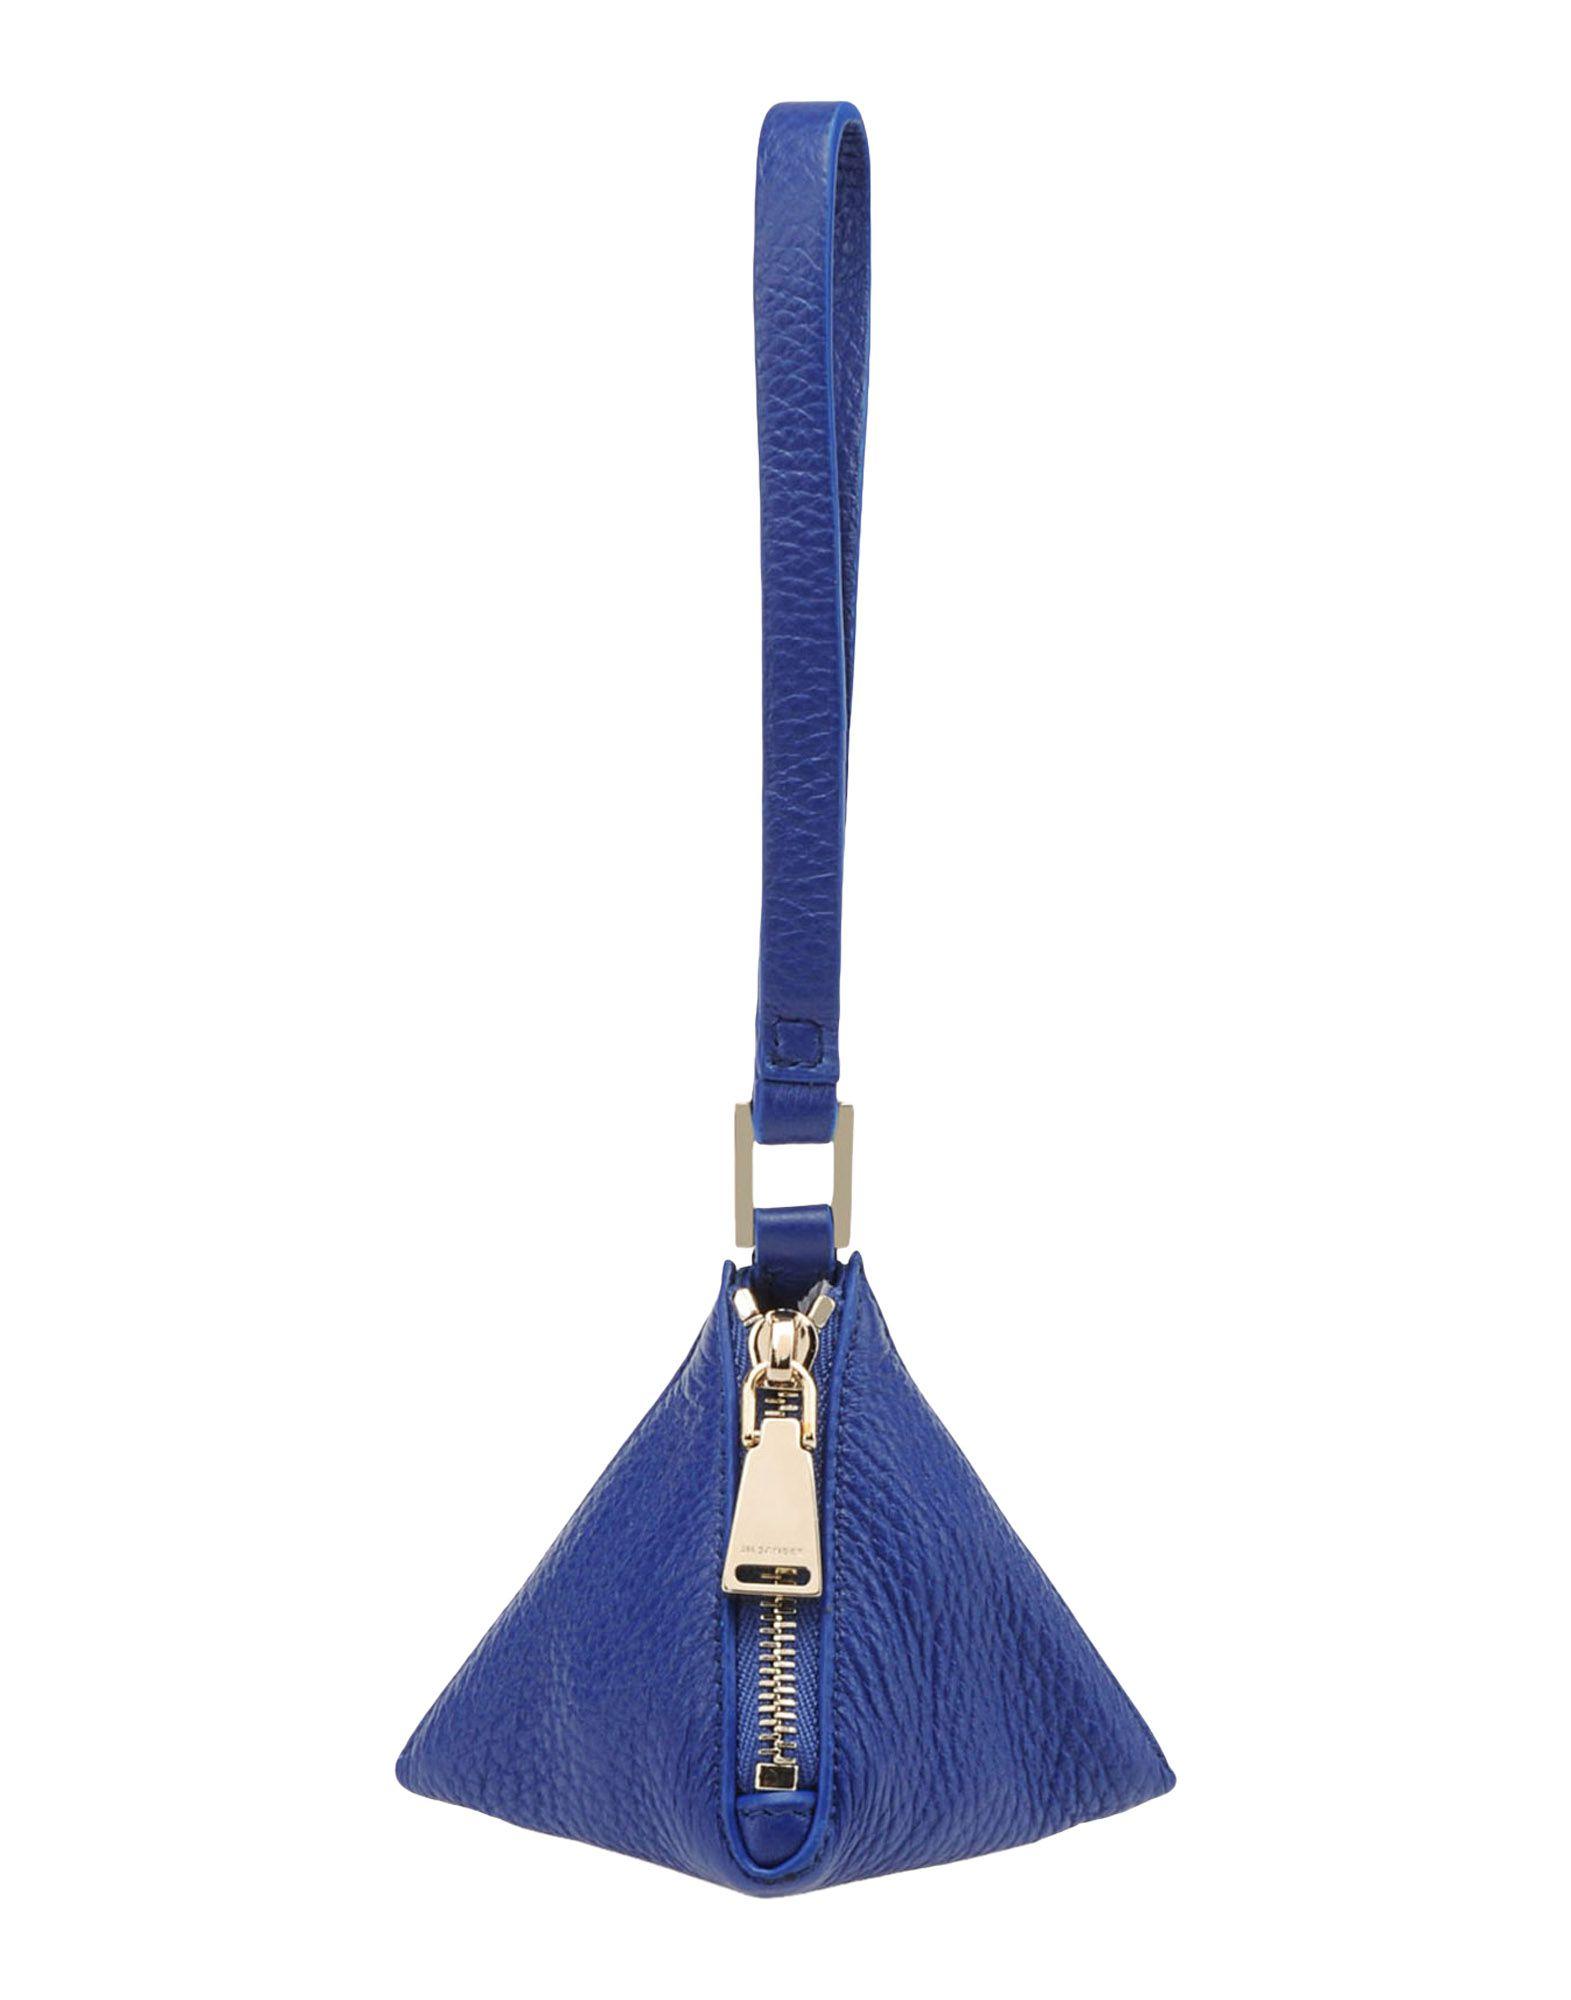 JIL SANDER Damen Portemonnaie Farbe Blau Größe 1